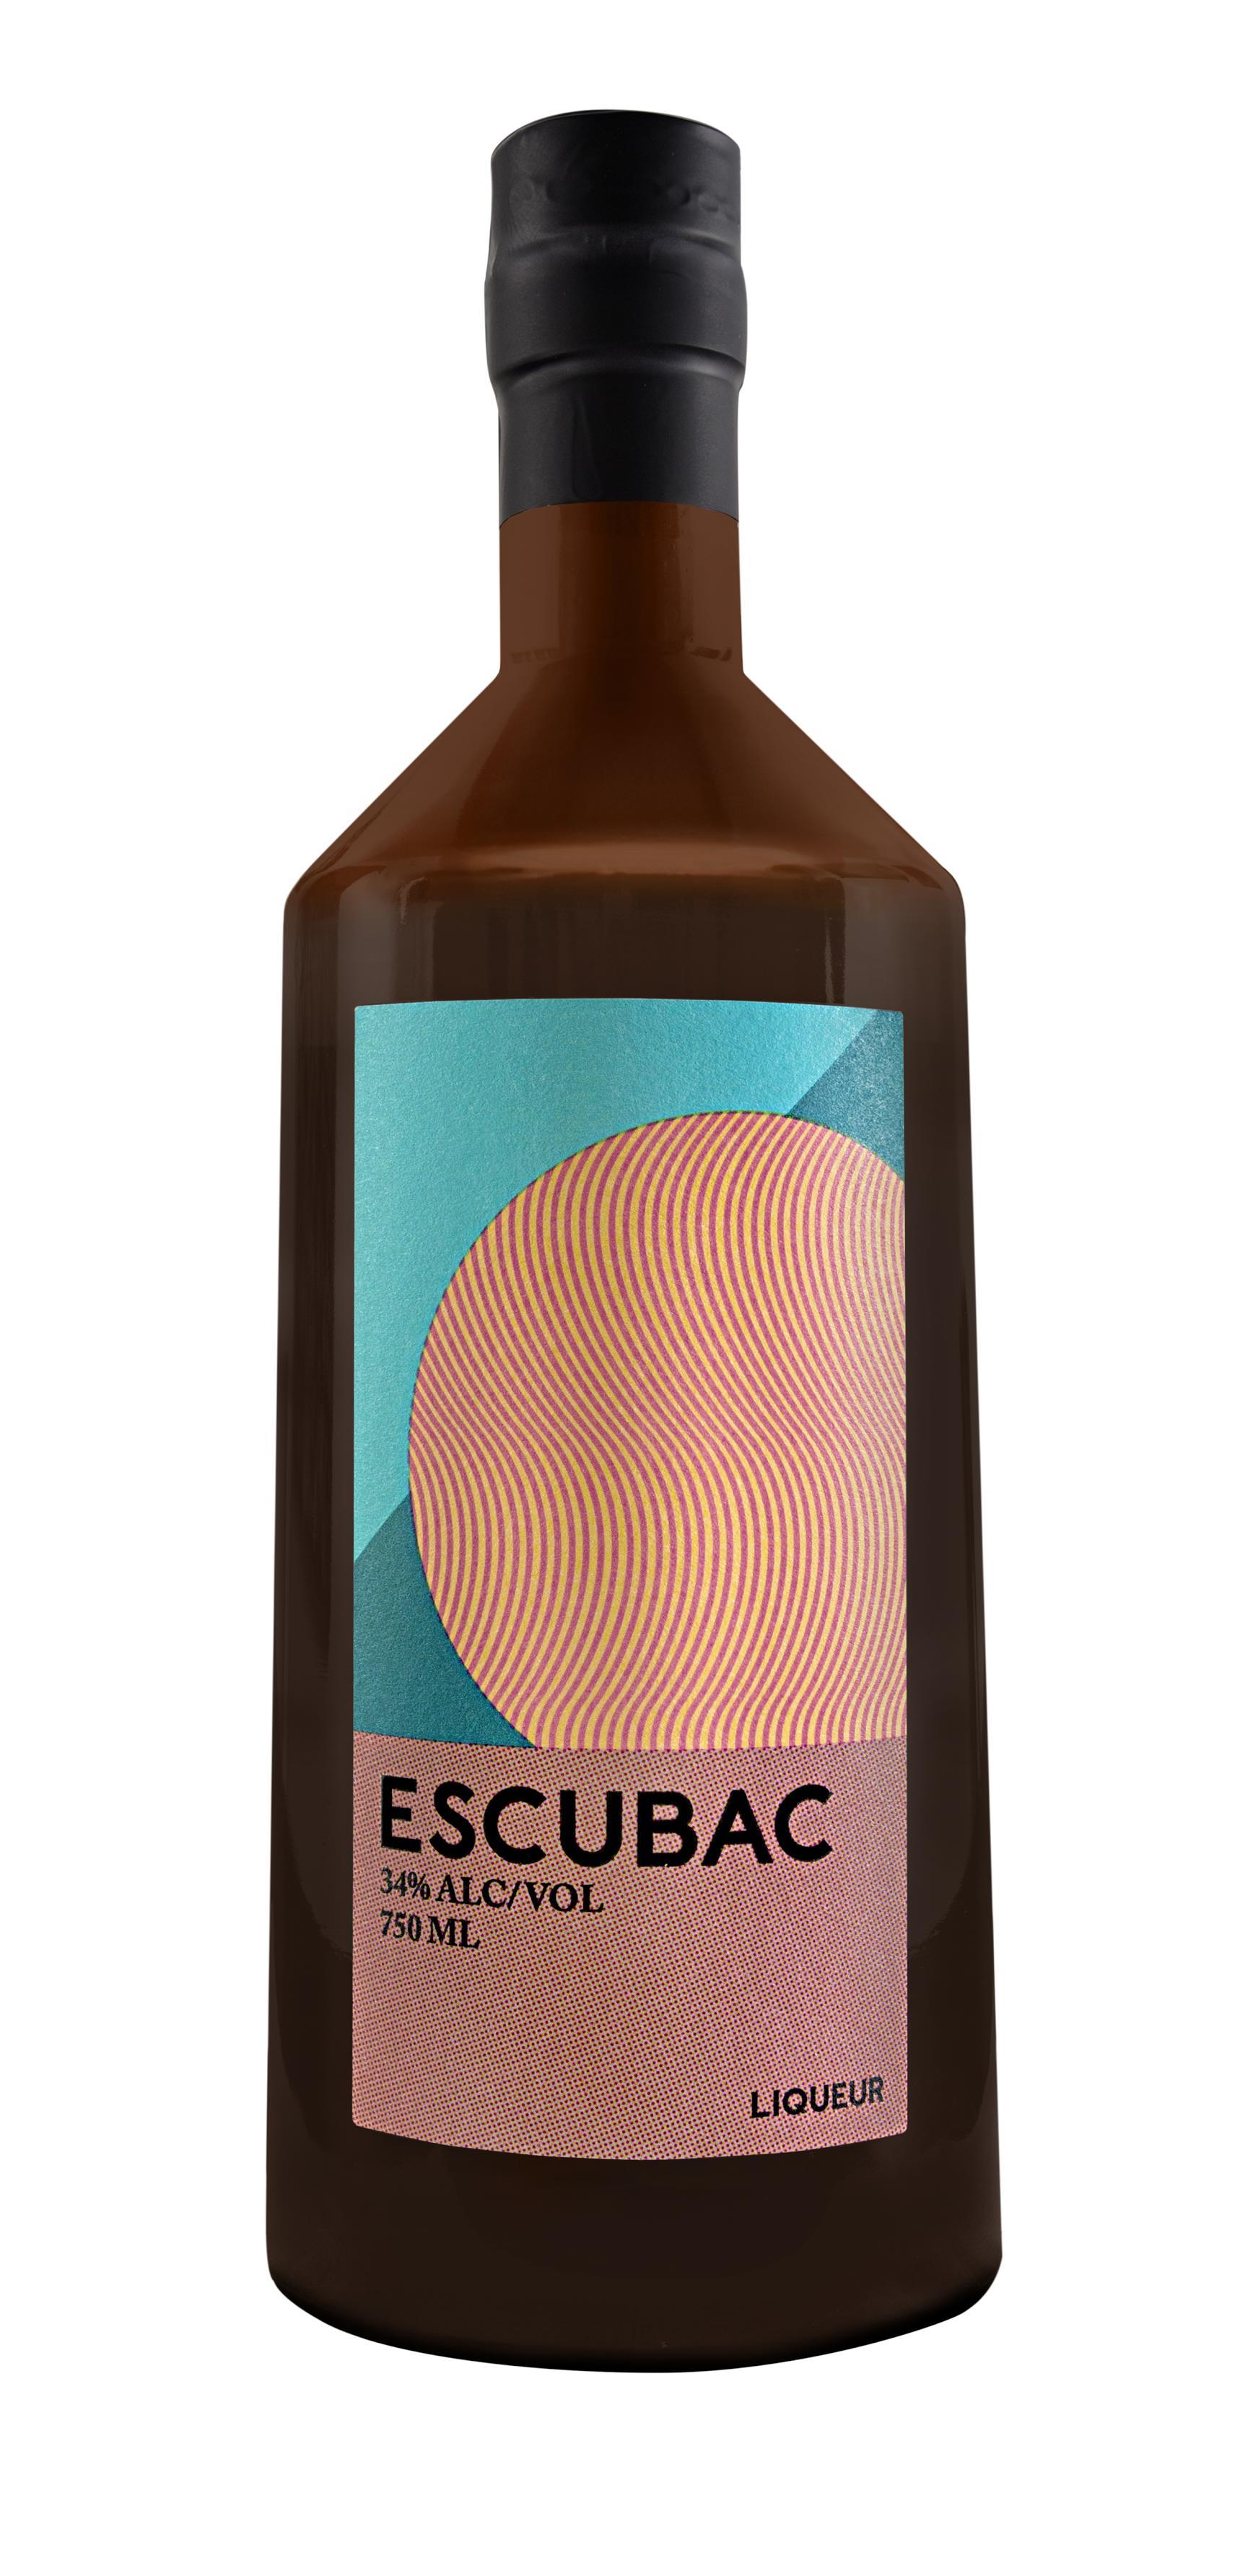 Escubac Botanical Spirit   Astor Wines   Spirits ee042c74a6ab